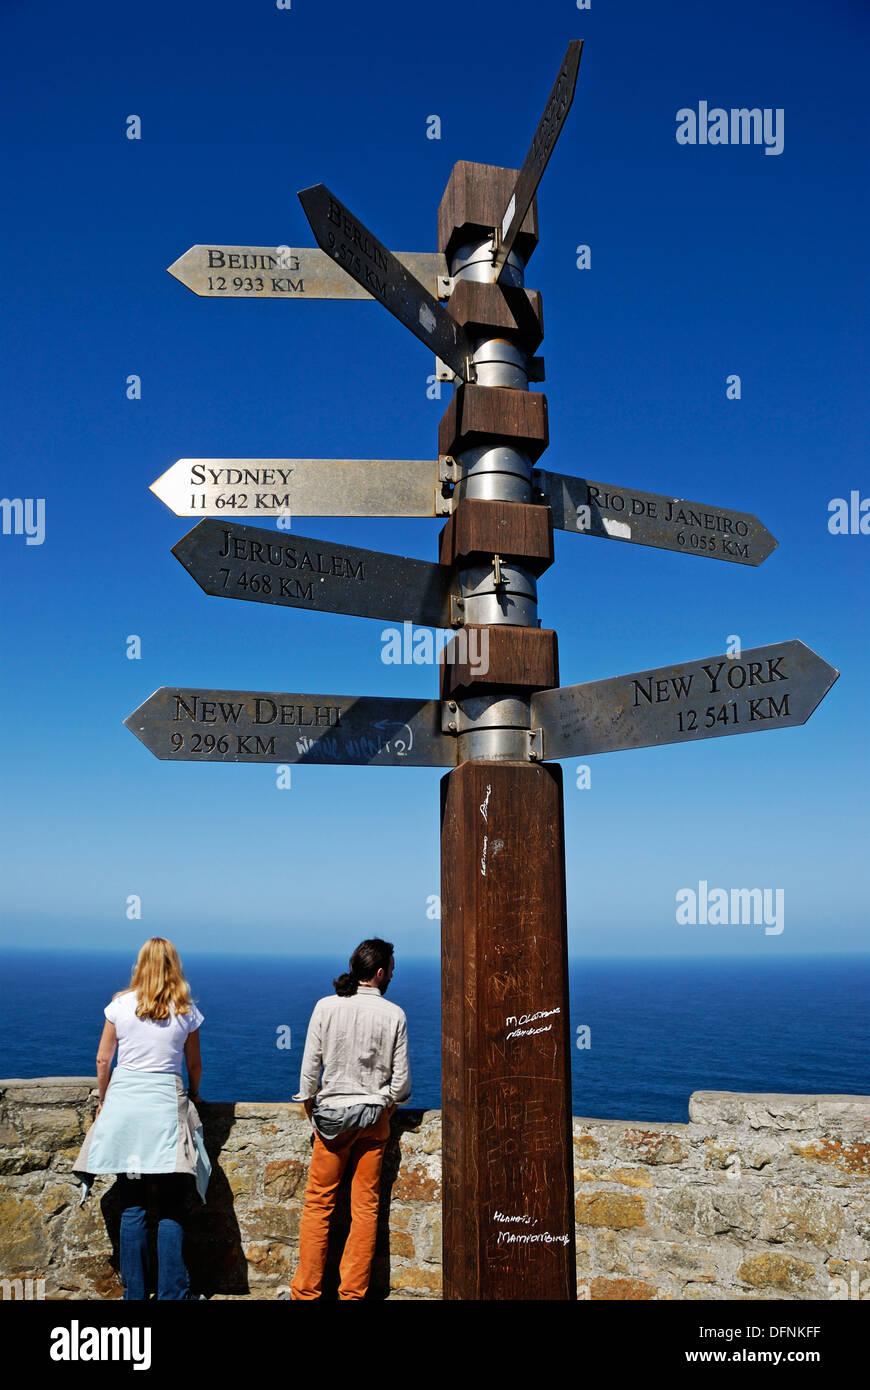 Paar mit Abstand Wegweiser zu Hauptstädten, Kap der guten Hoffnung, Provinz Westkap, Südafrika Stockbild